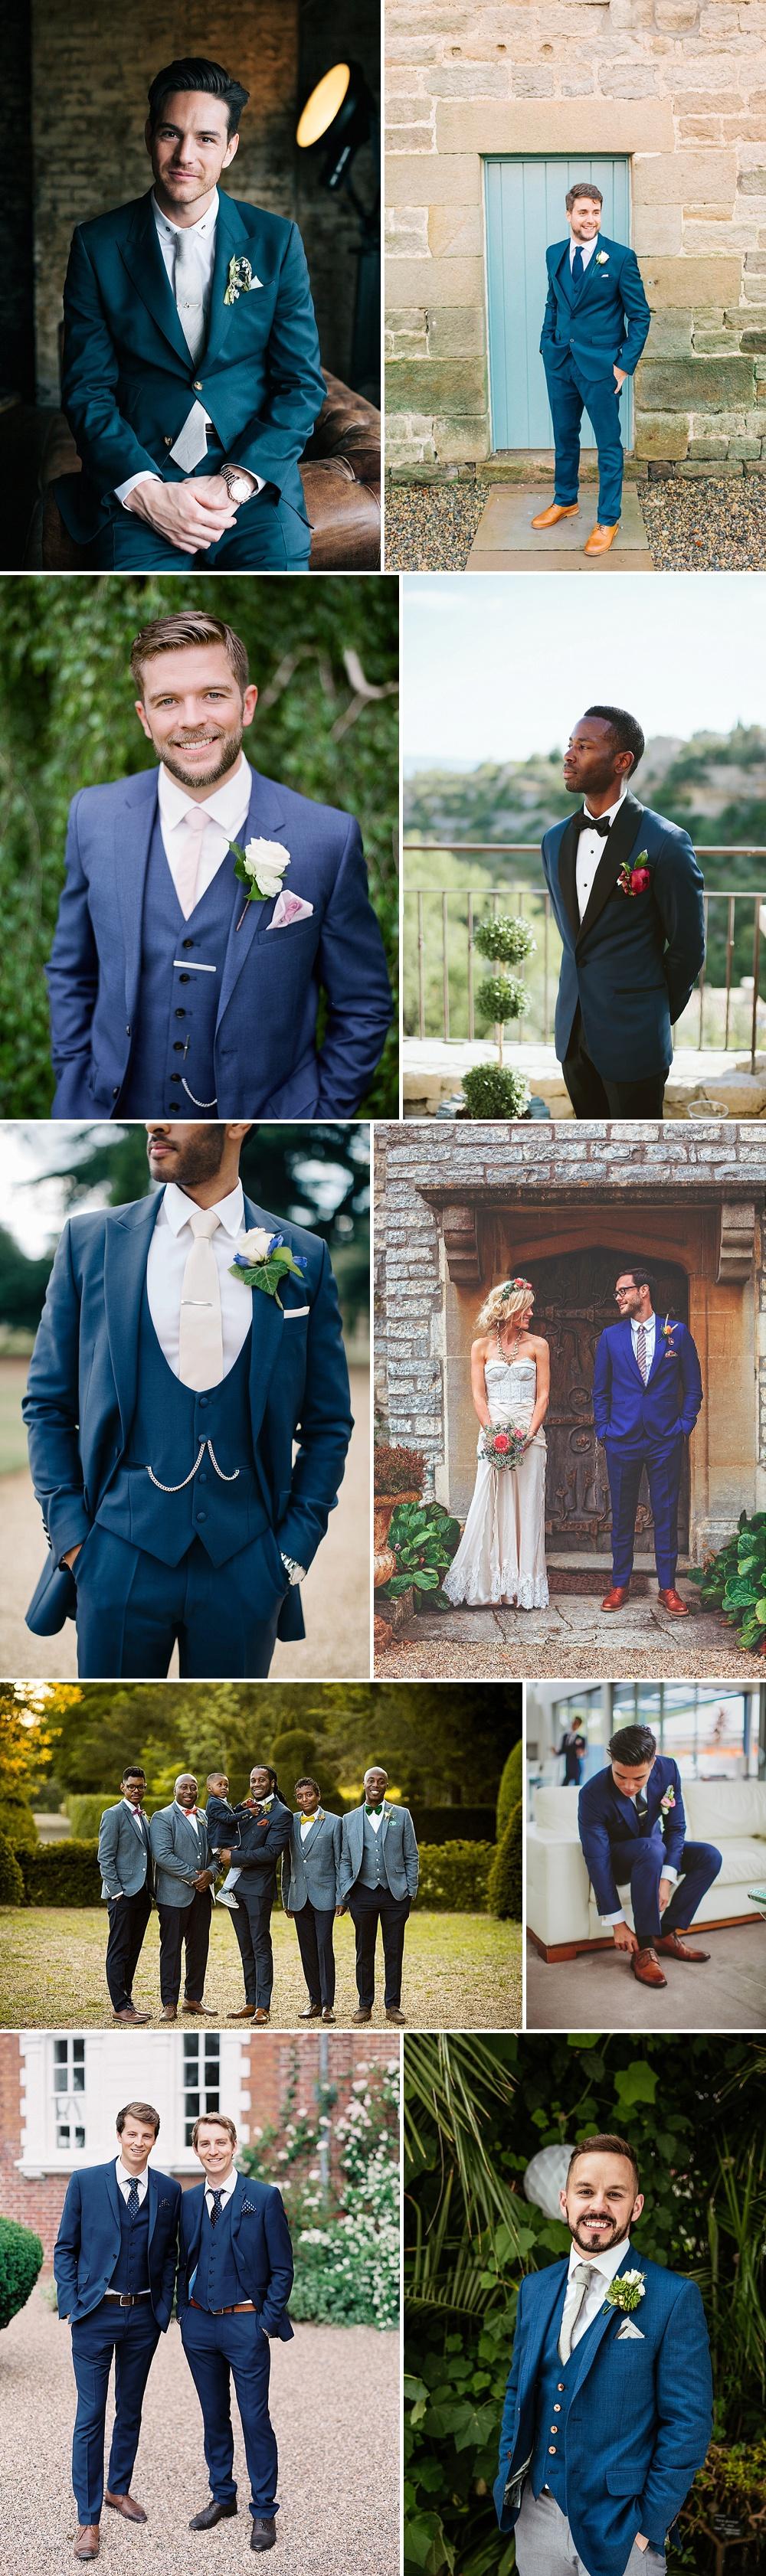 Groom Wearing Royal Blue For Wedding | Groom Fashion Inspiration